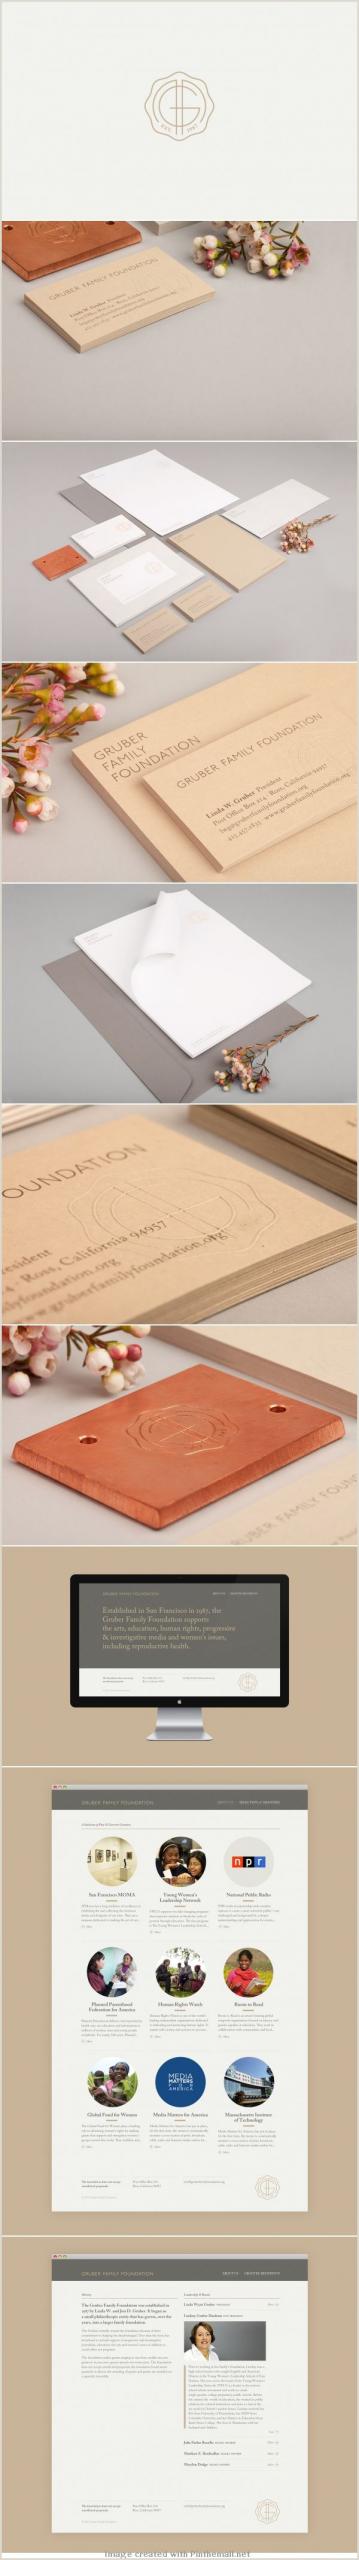 Printed Visiting Cards 14 Popular Hardwood Flooring Business Card Template